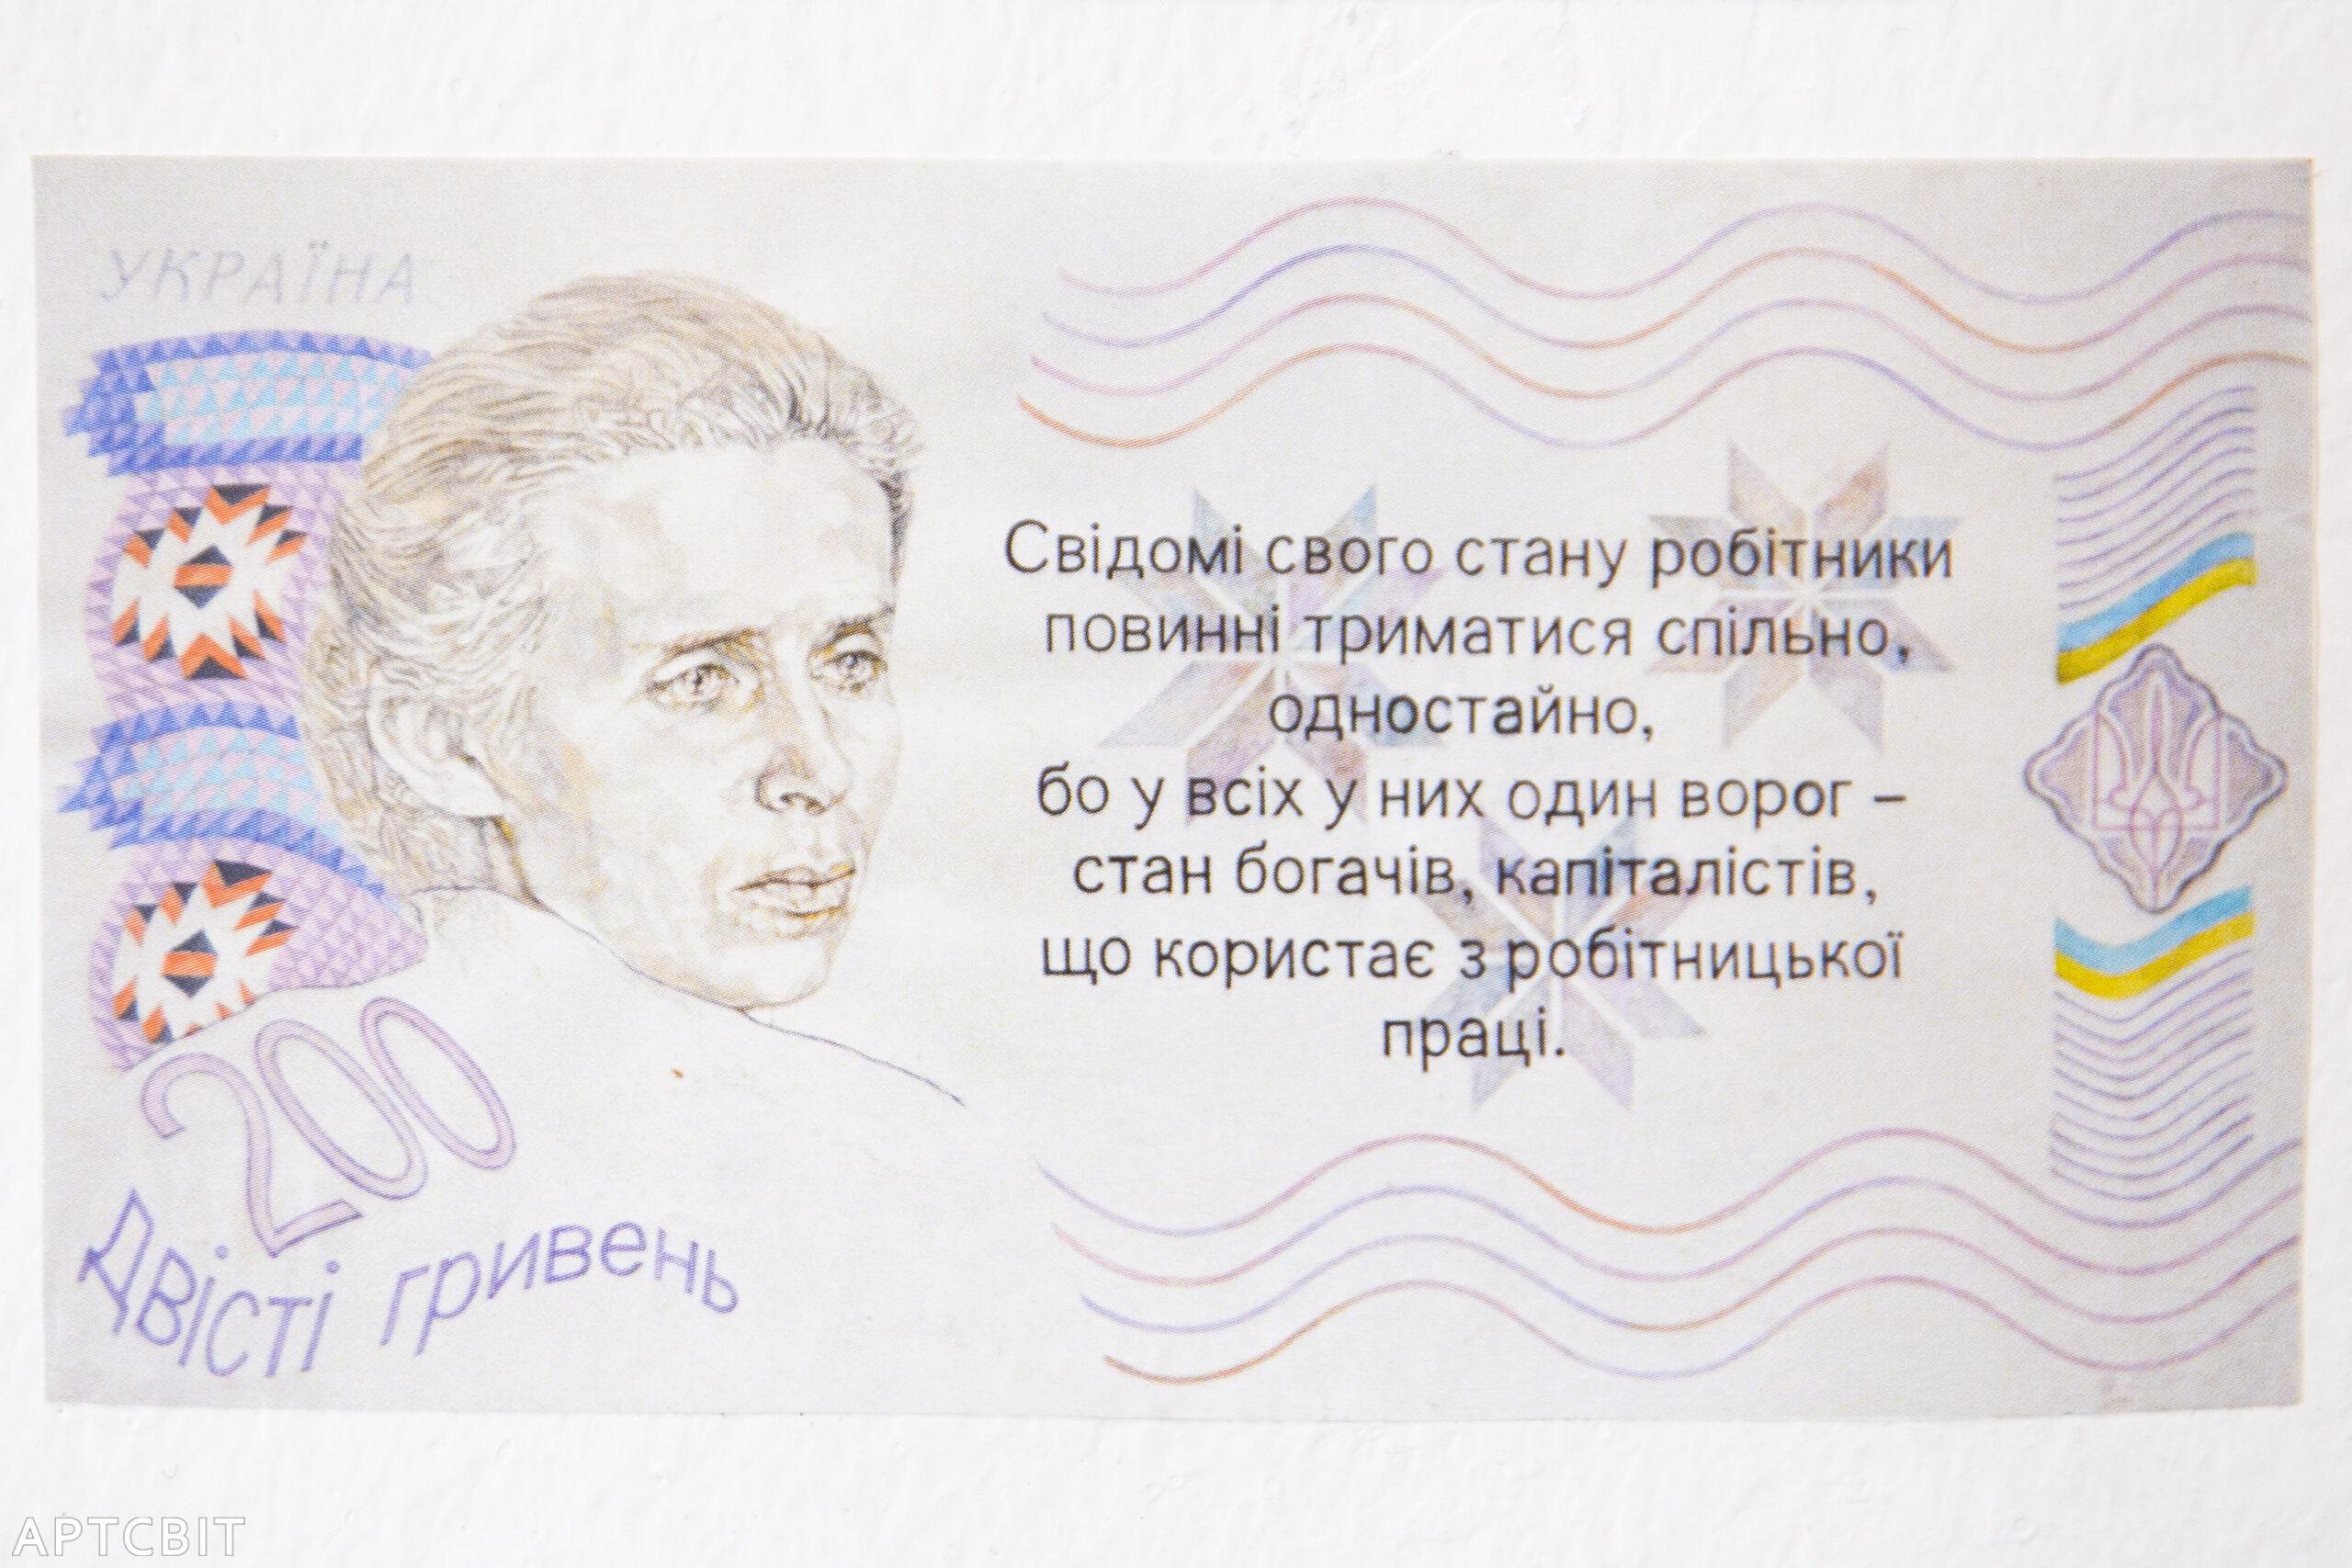 Фото: Олександр Матюшкін